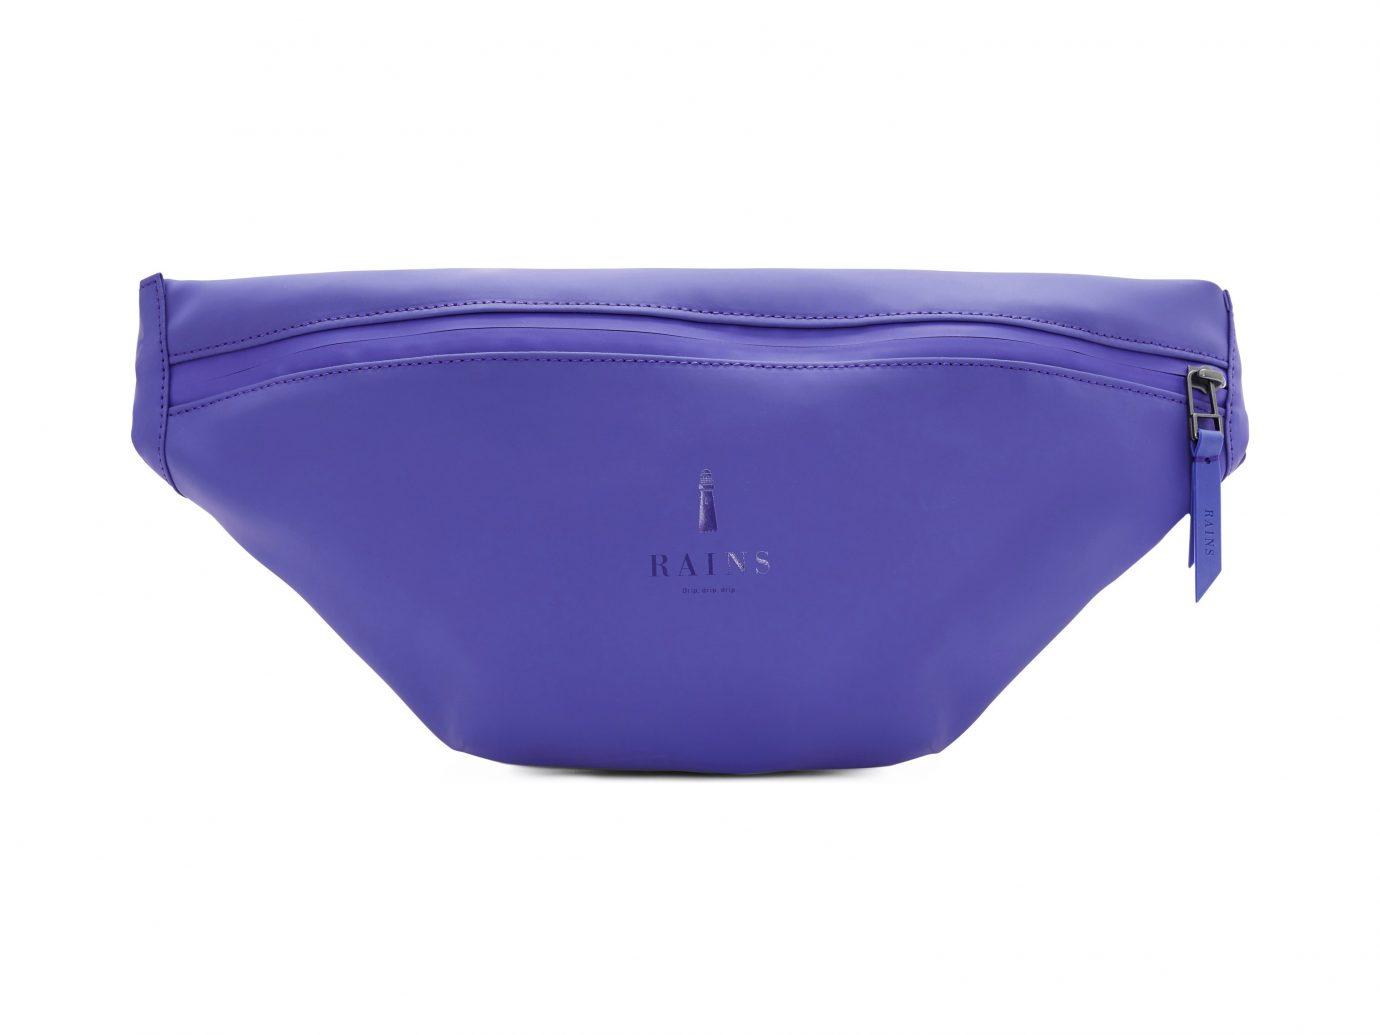 RAINS Belt Bag in Lilac